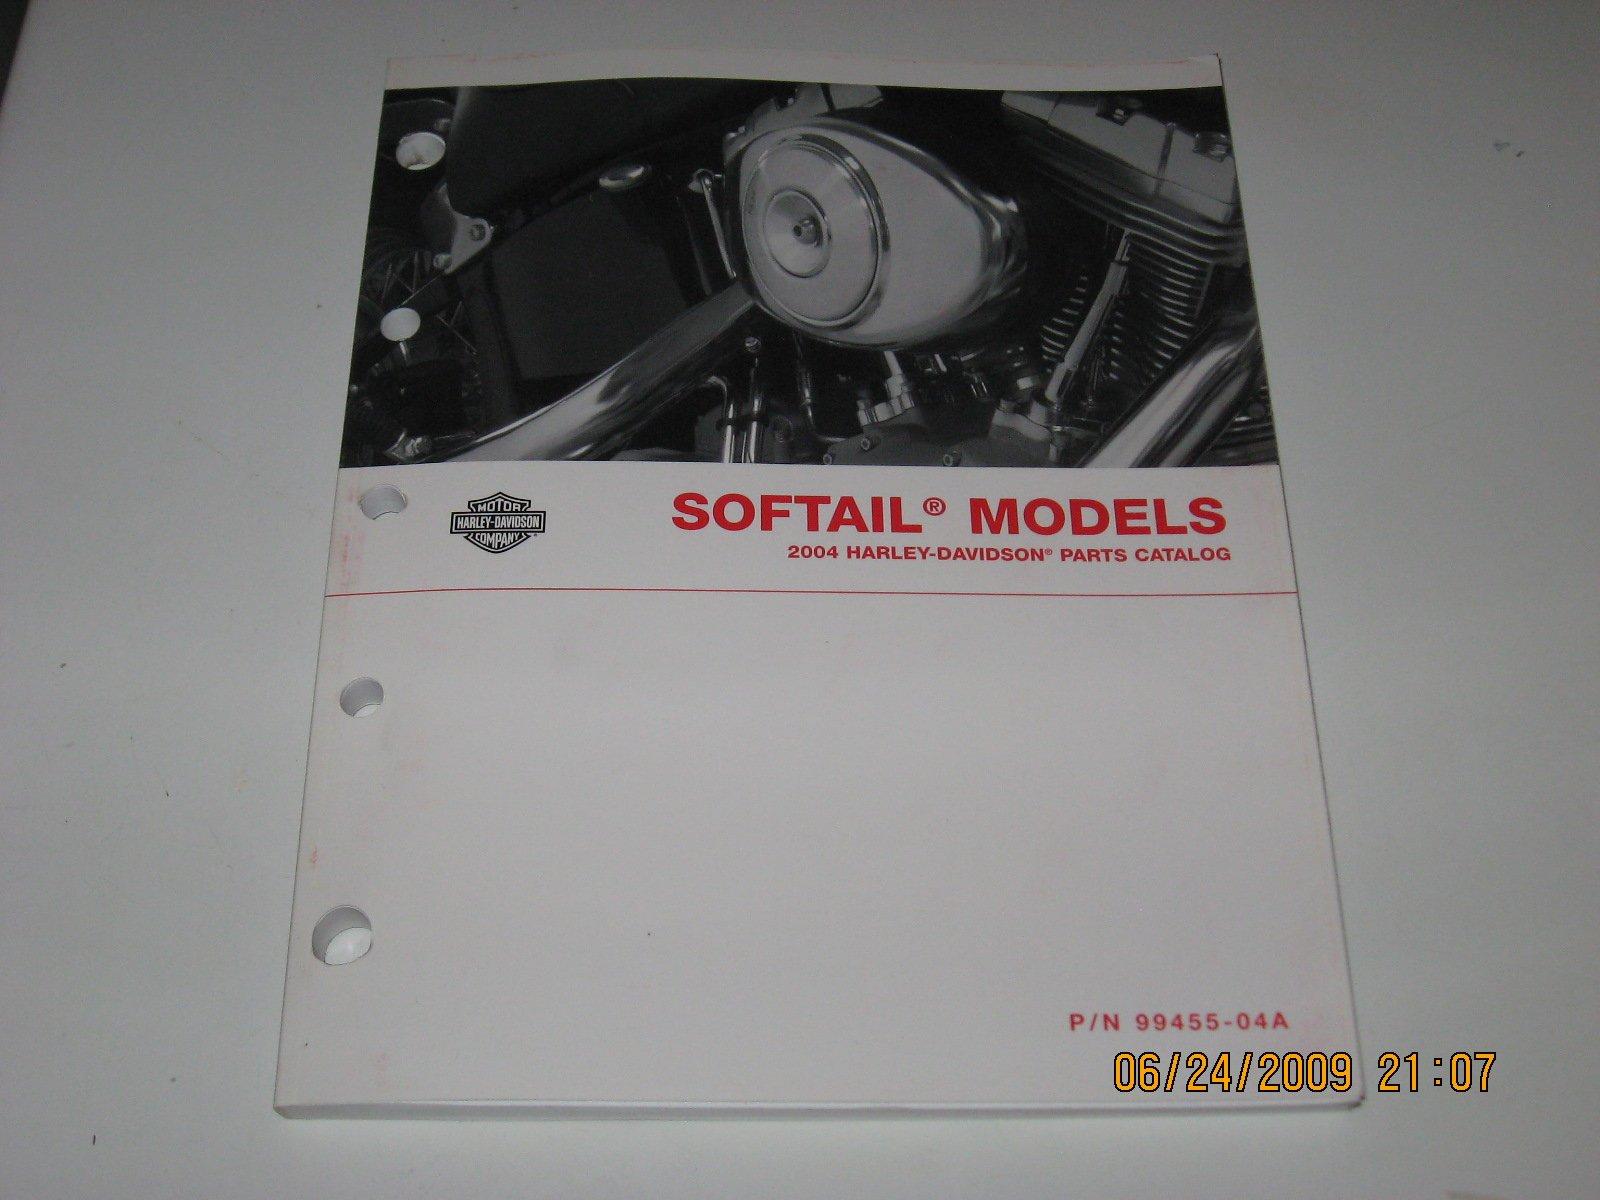 2004 Harley Davidson Softail Models Parts Catalog: Harley Davidson Motor  Company: Amazon.com: Books